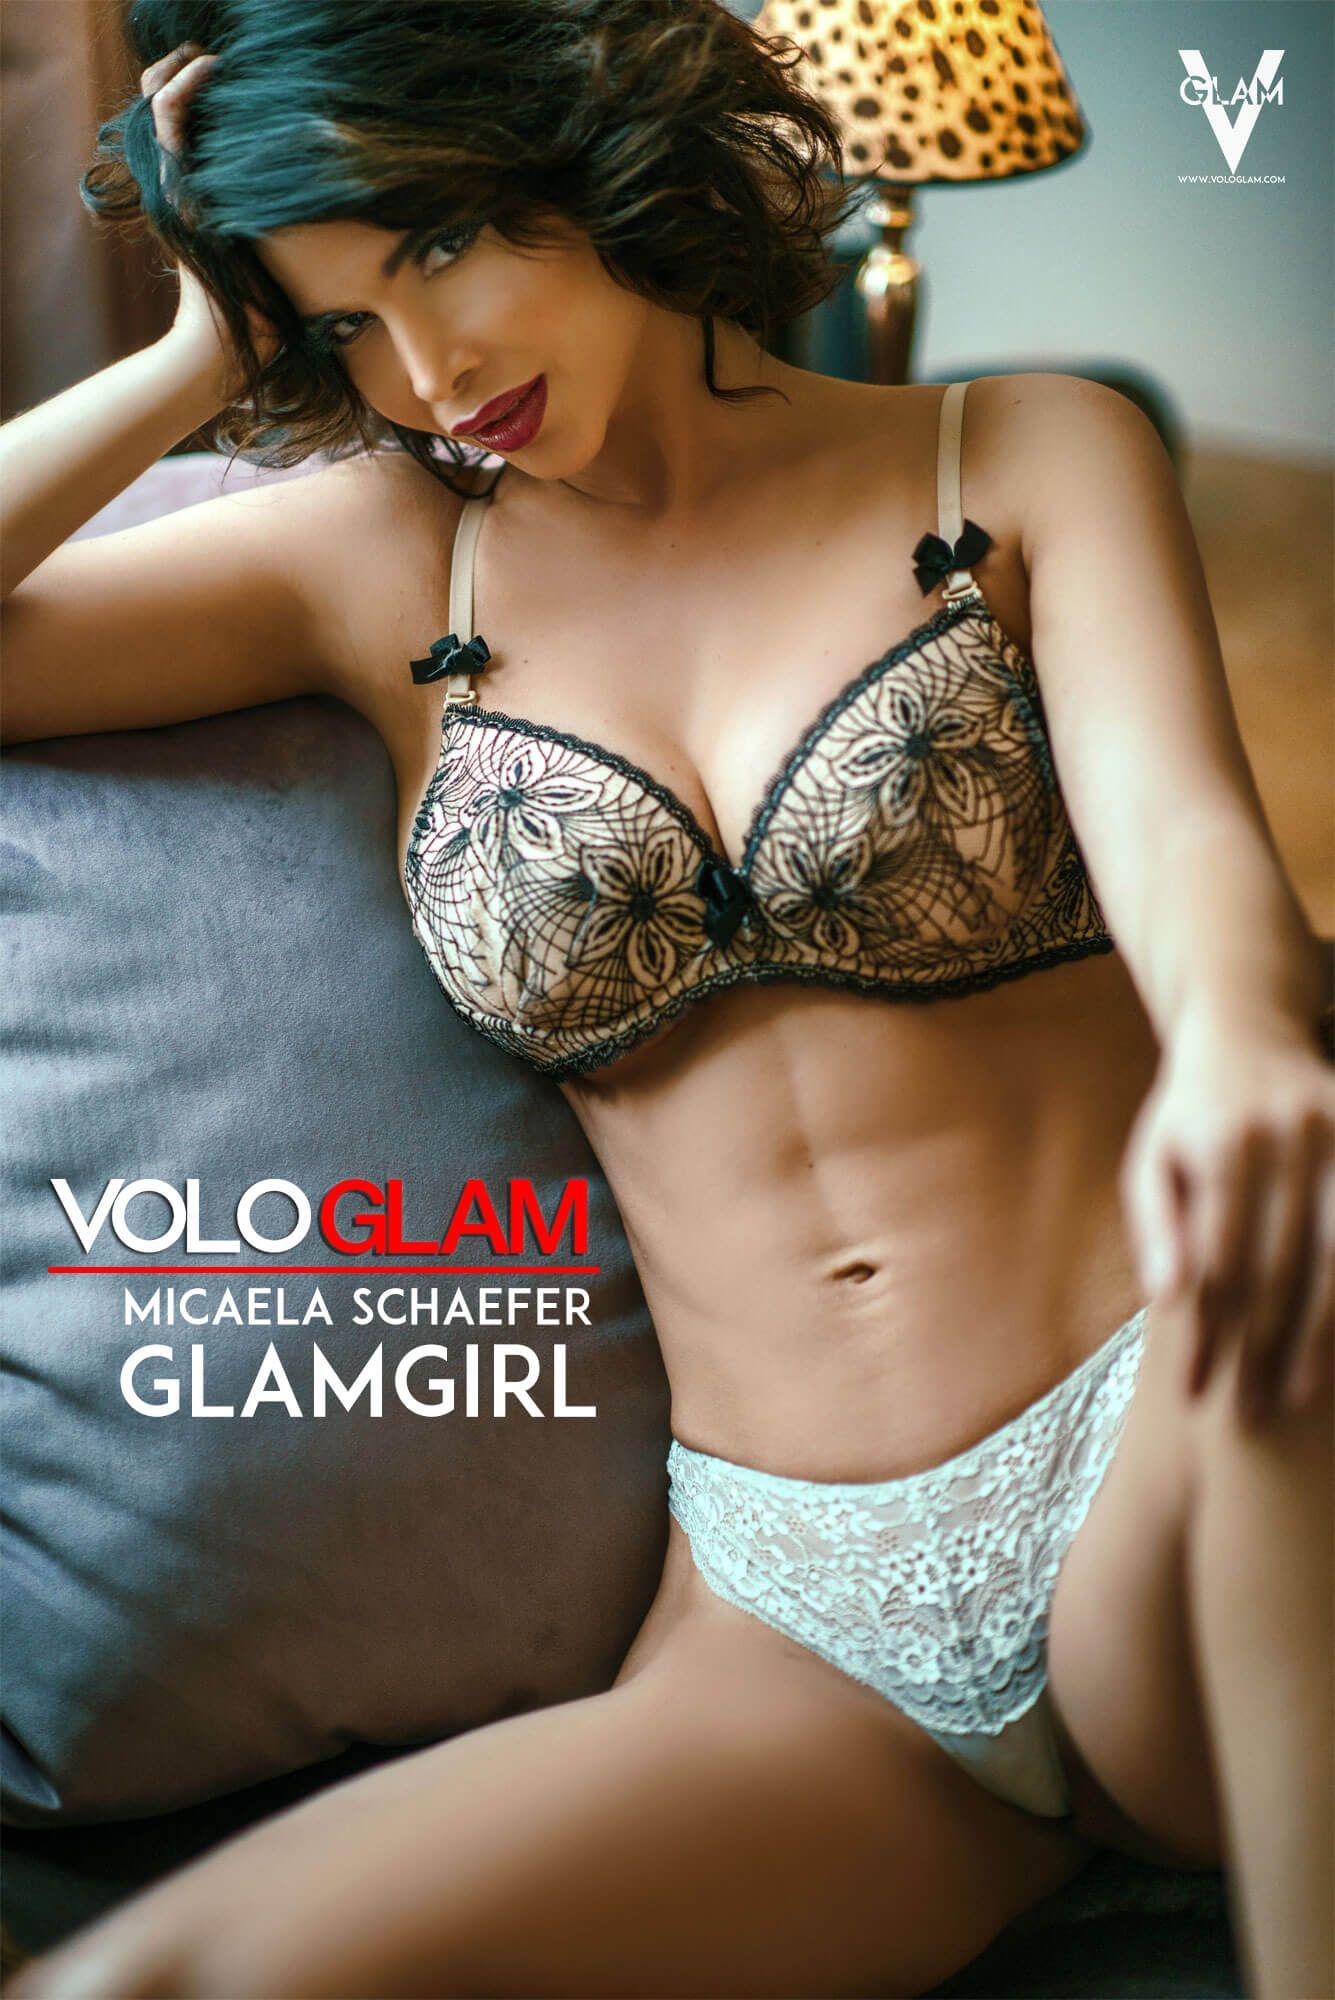 Communication on this topic: Kristin cavallari, micaela-schafer-sexy-8-new-photos/